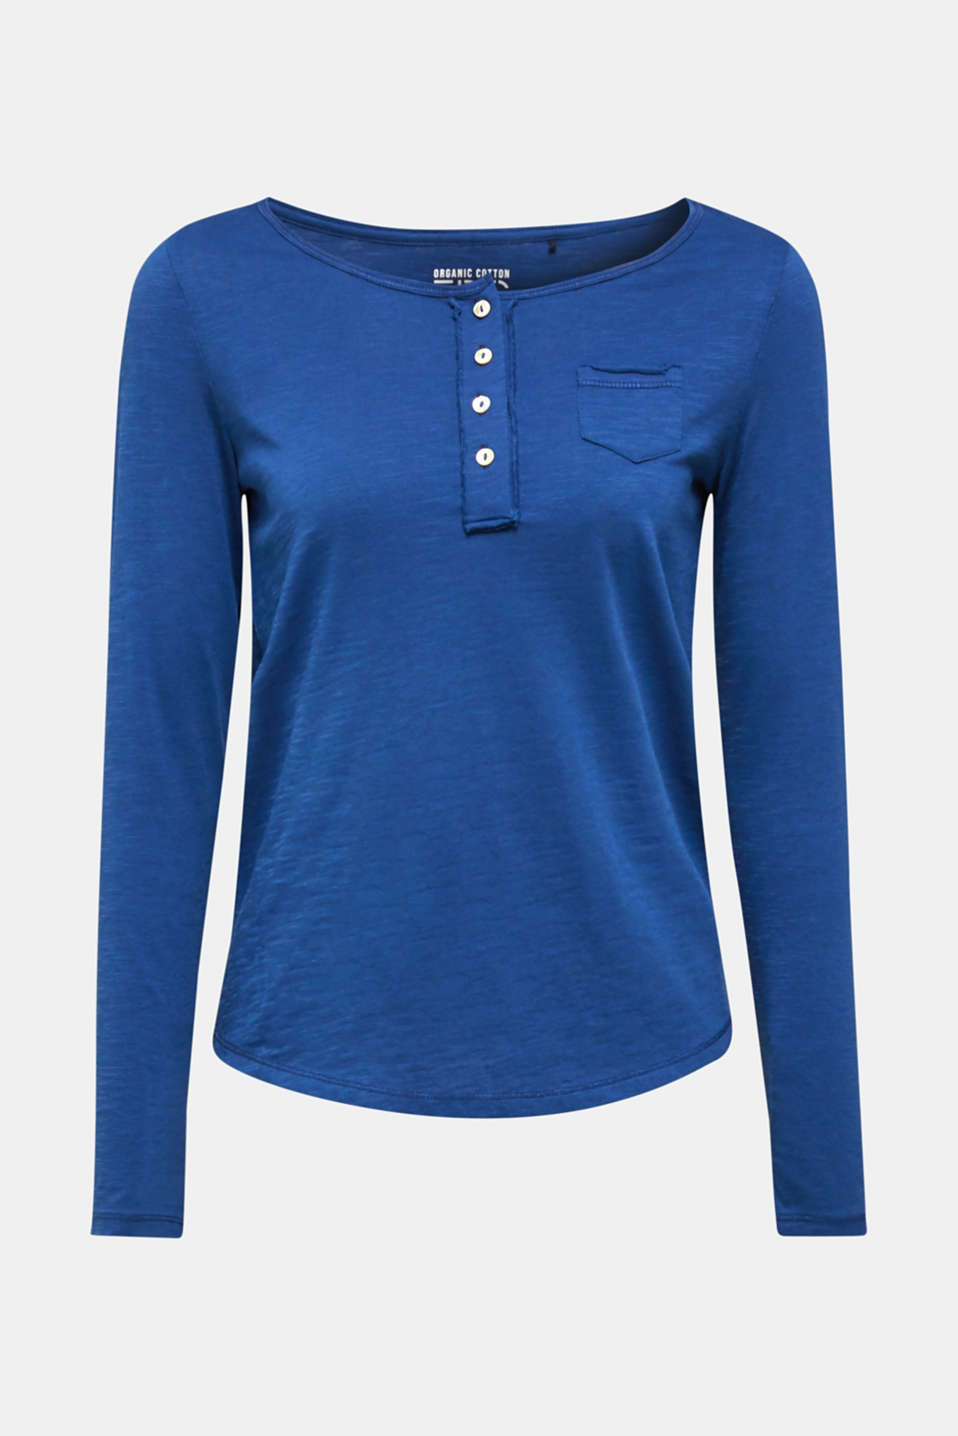 T-Shirts, DARK BLUE, detail image number 5